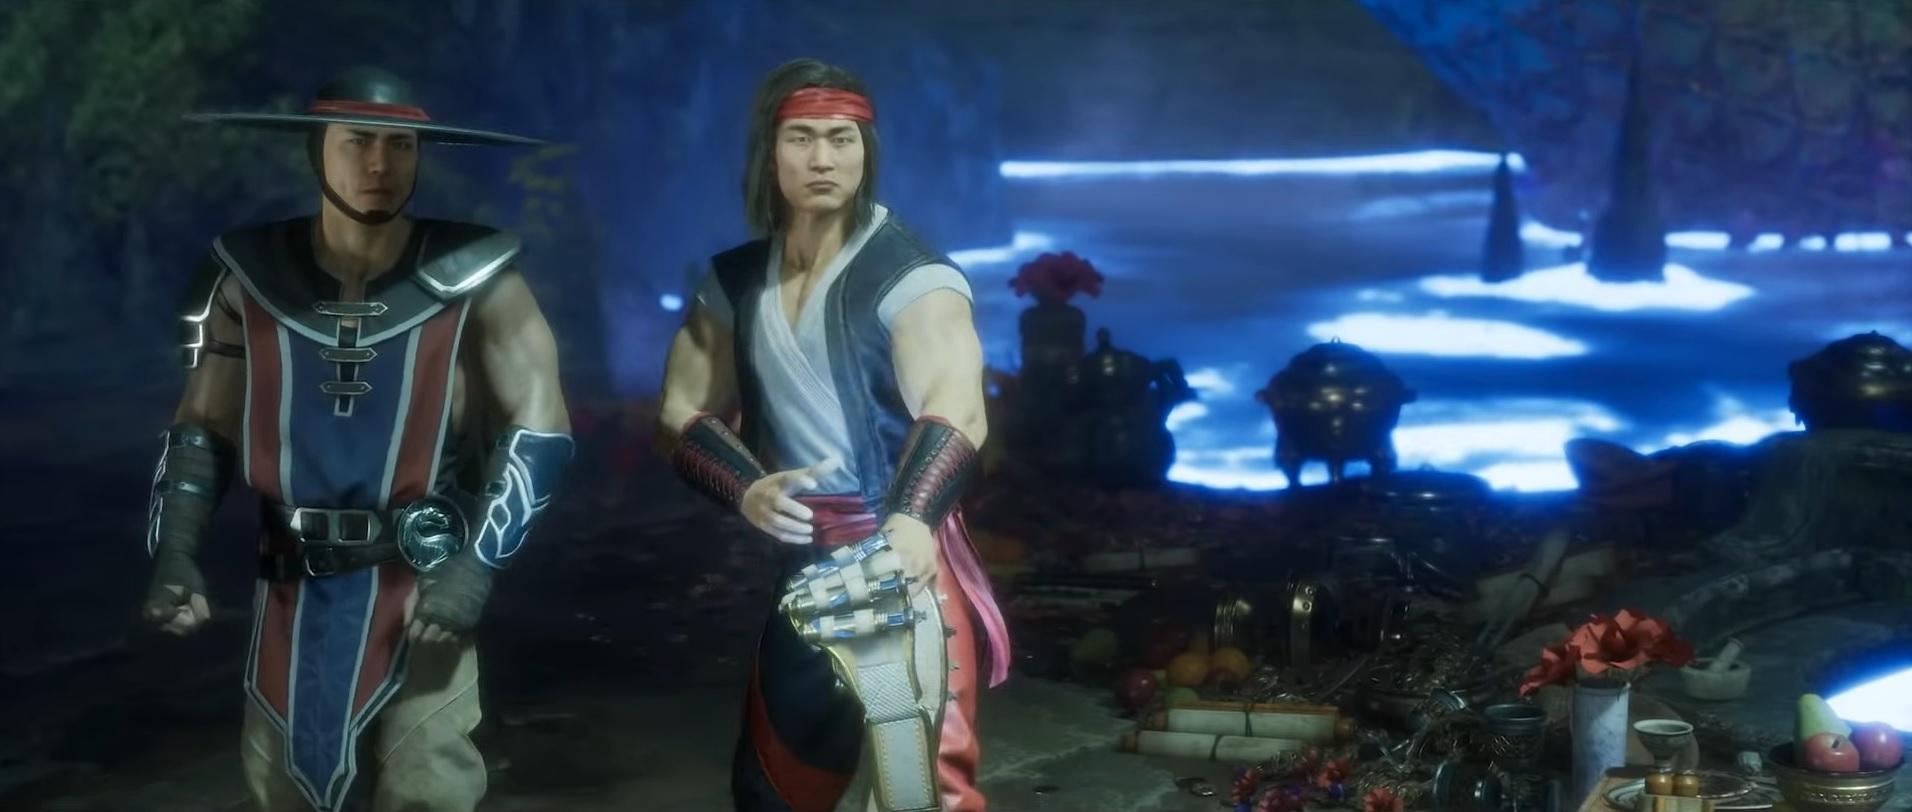 Mortal Kombat 11 Fighters - All Mortal Kombat 11 Kombatants